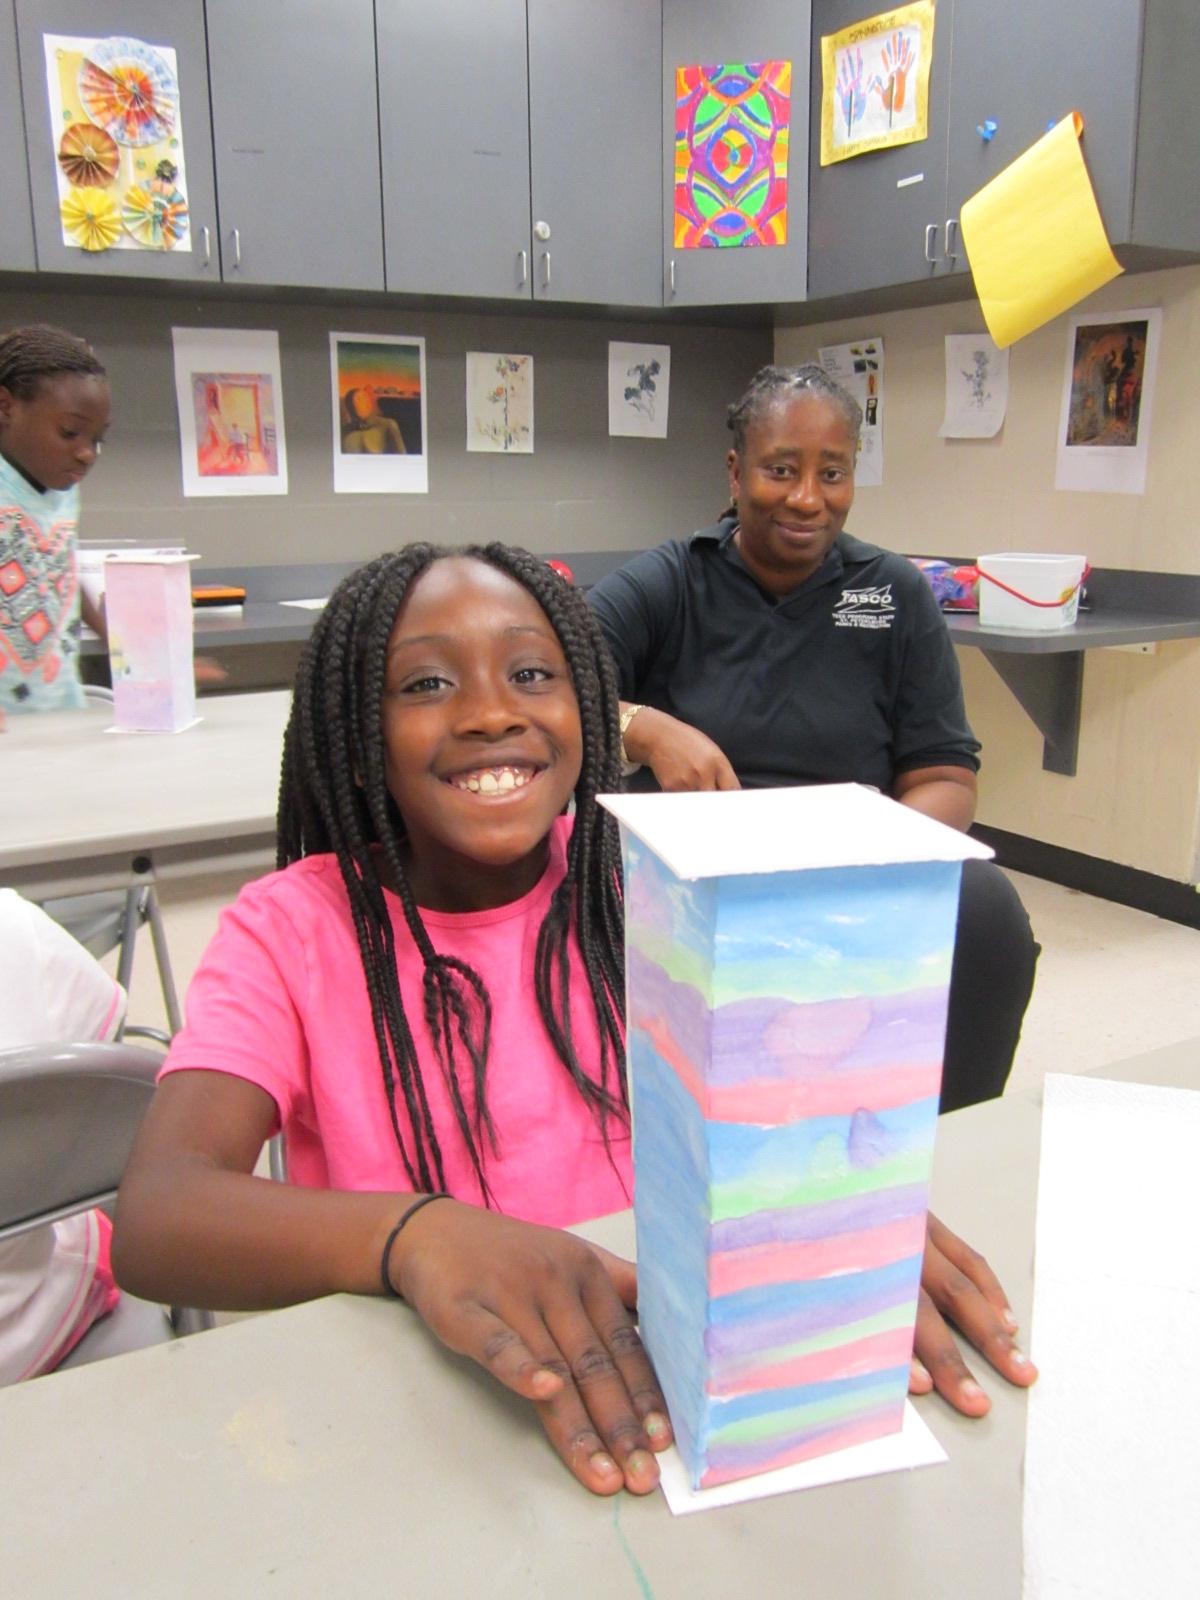 A proud Child's Park lantern maker as Yolanda looks on